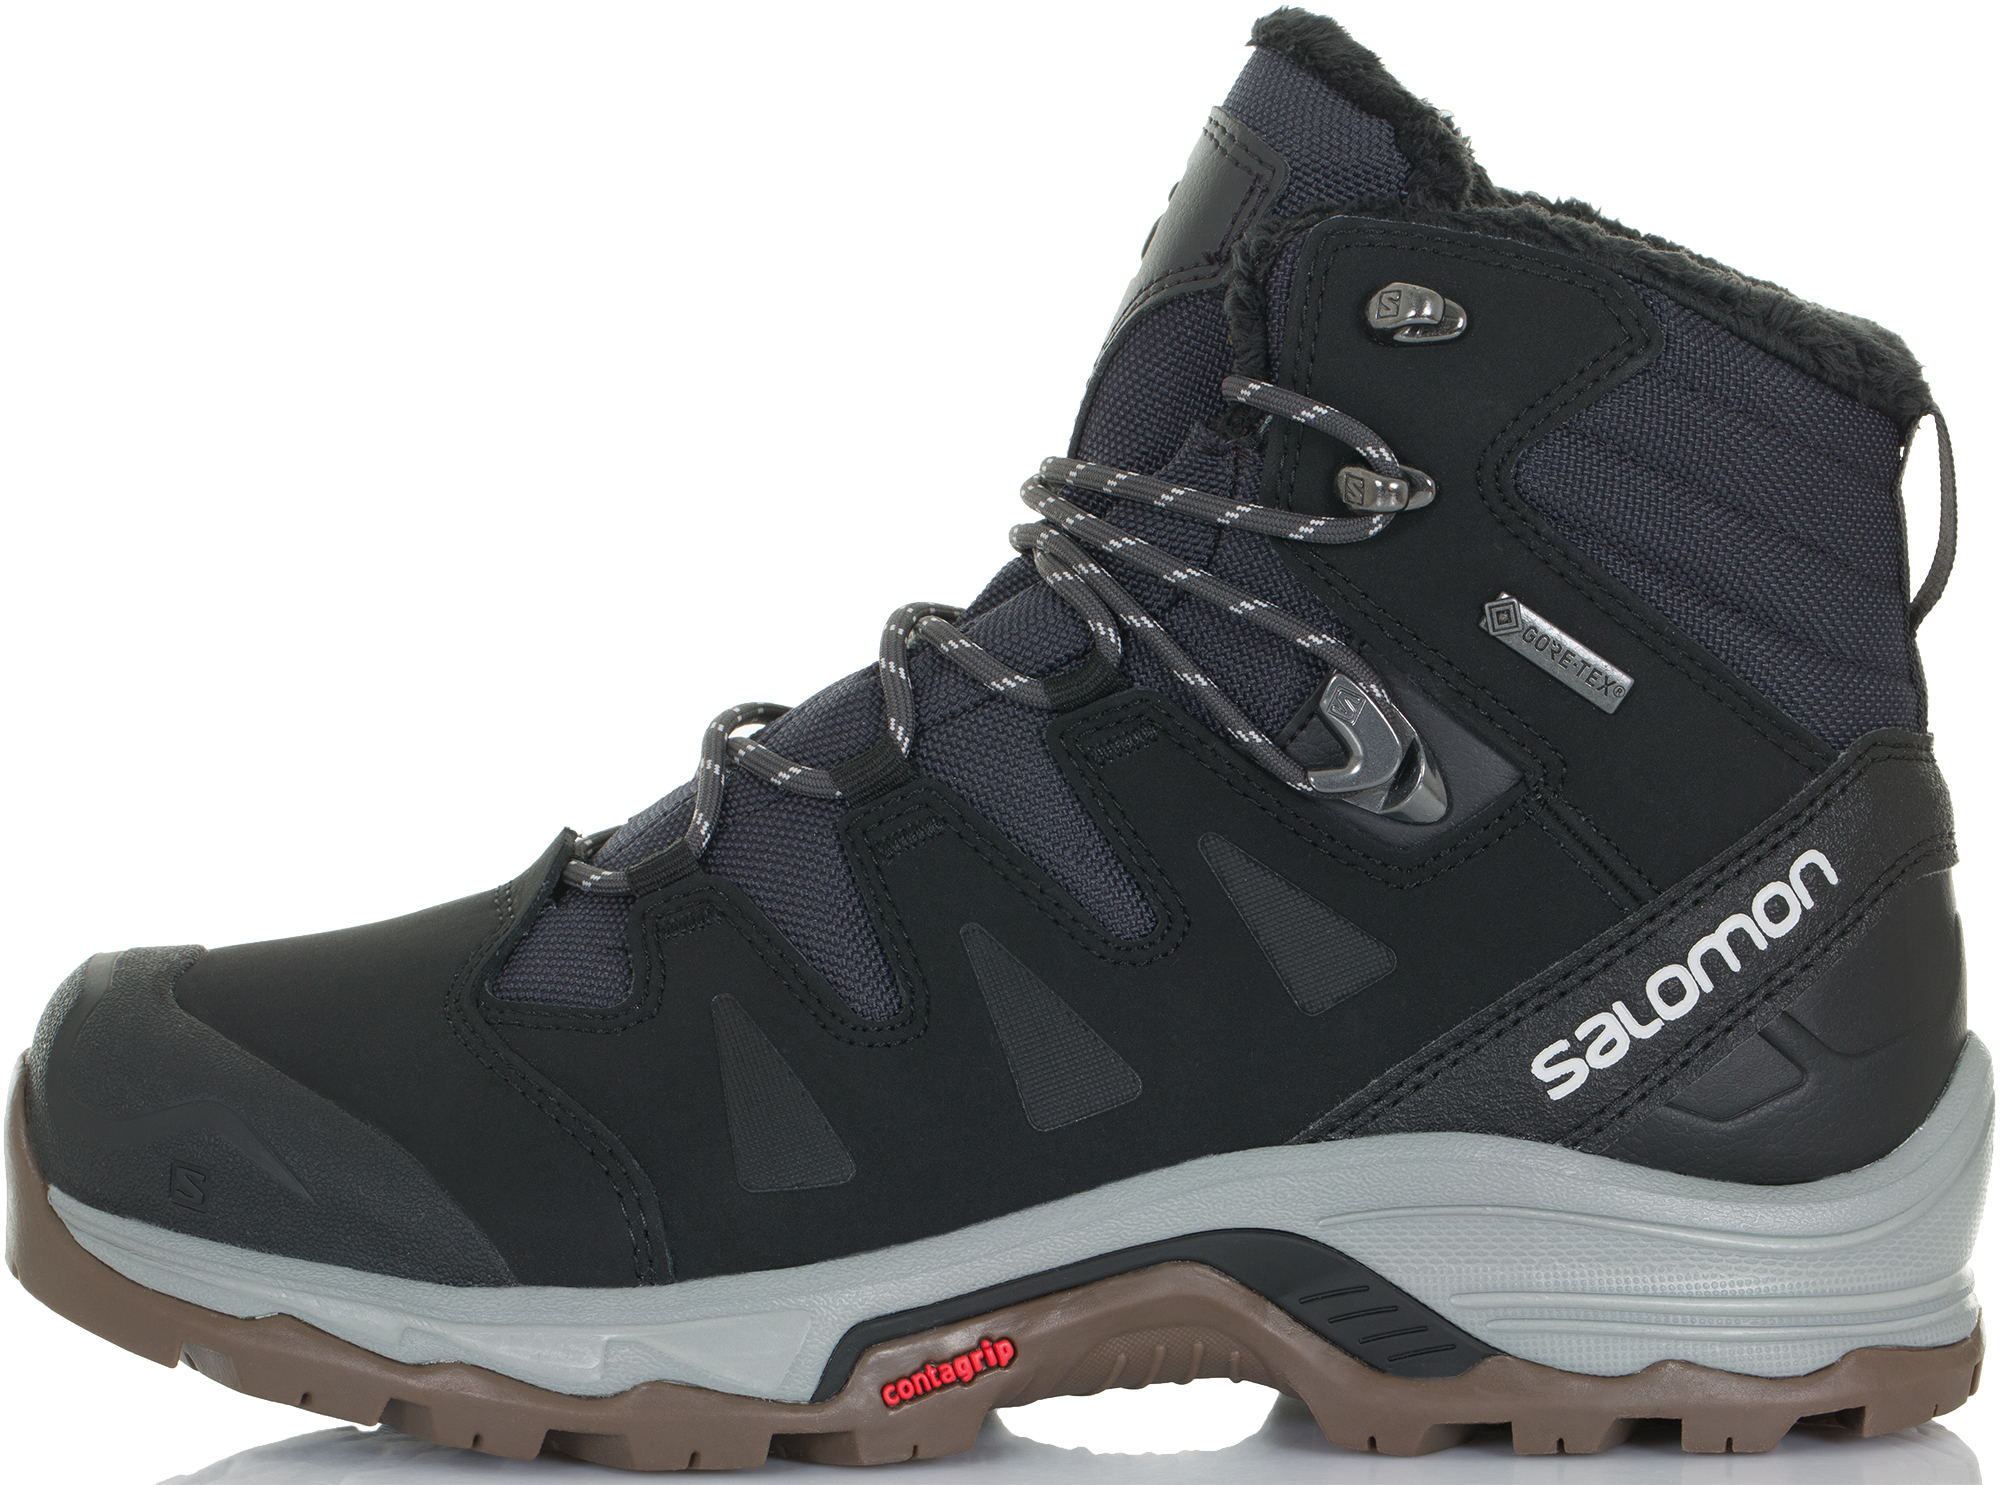 Salomon Ботинки утепленные мужские Salomon Quest Winter Gtx, размер 42.5 salomon ботинки утепленные мужские salomon crusano размер 40